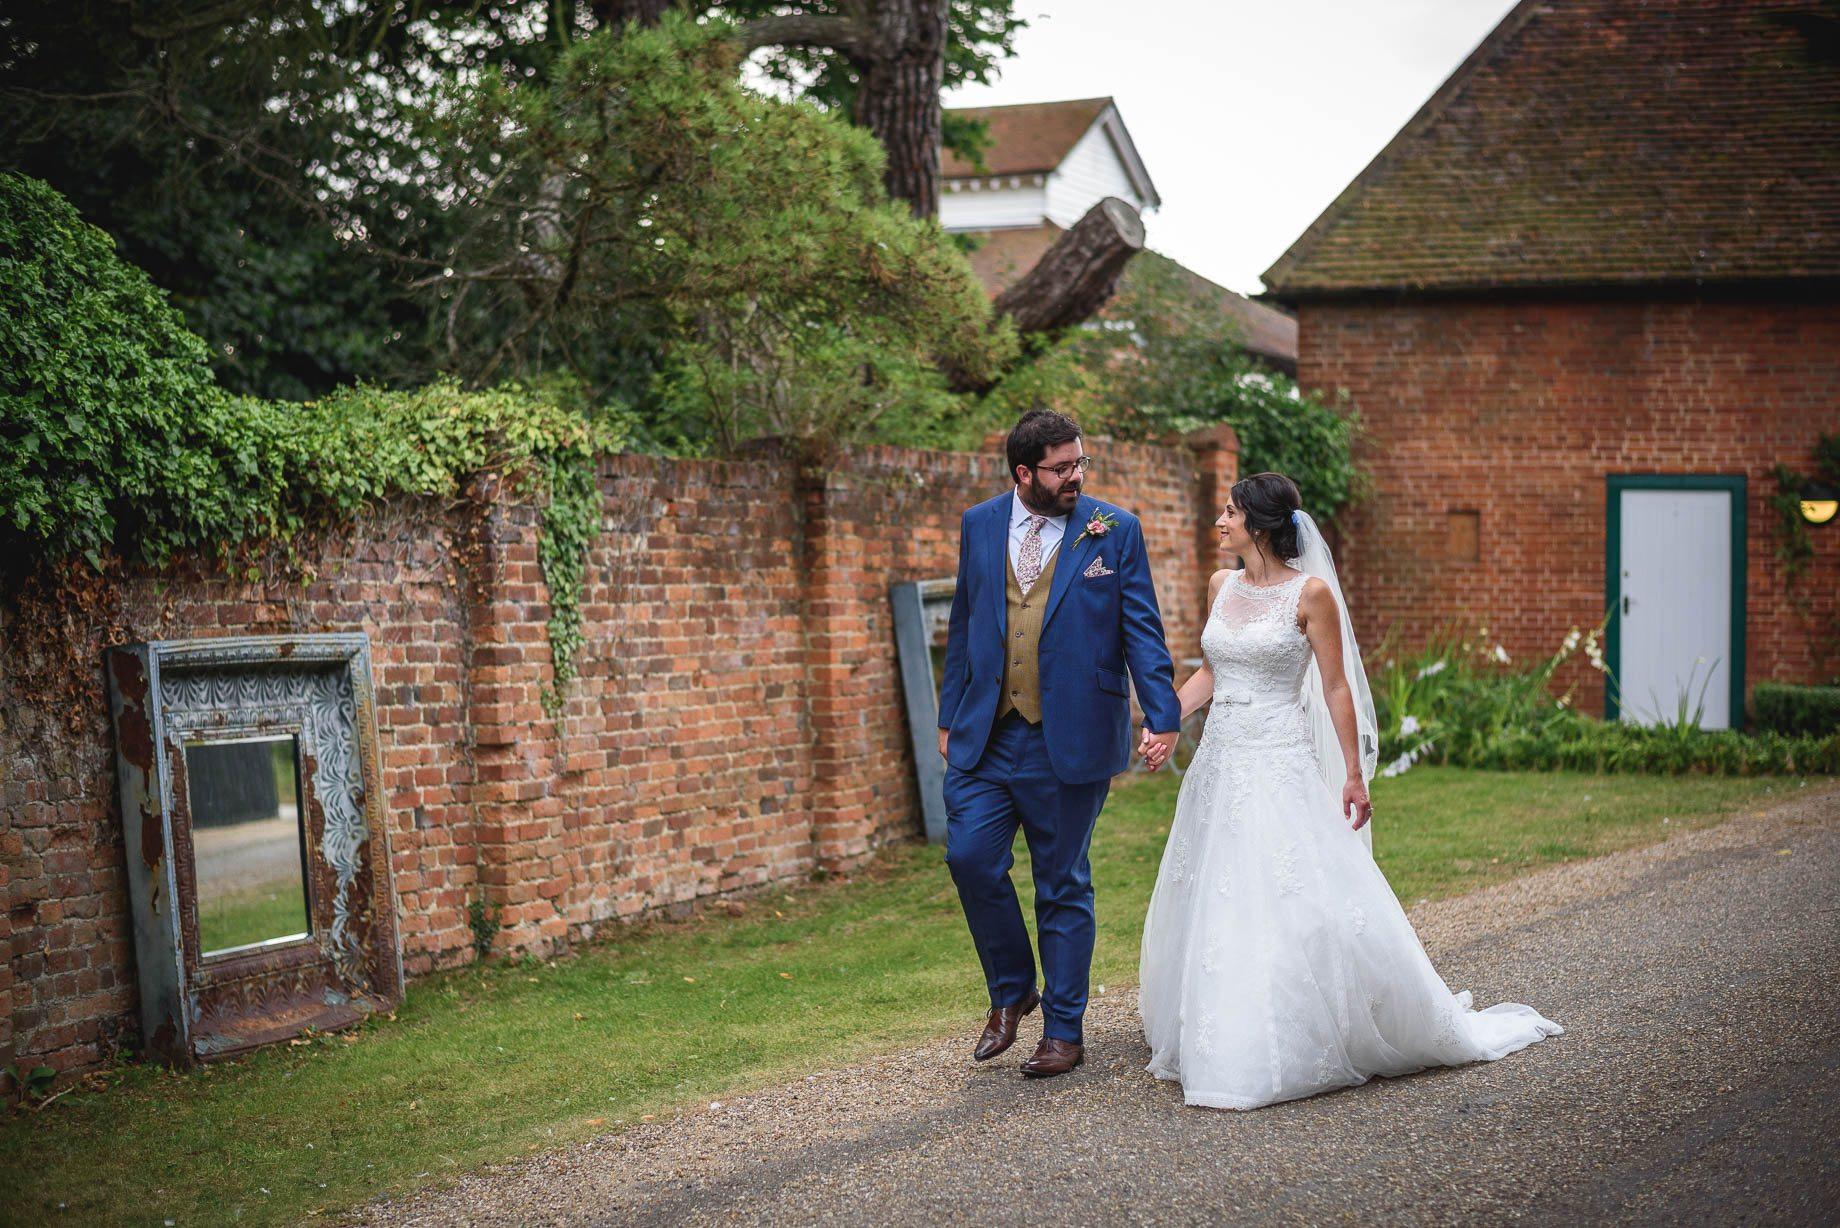 Gaynes Park wedding photography - Guy Collier Photography - Rachel and Jon (137 of 169)